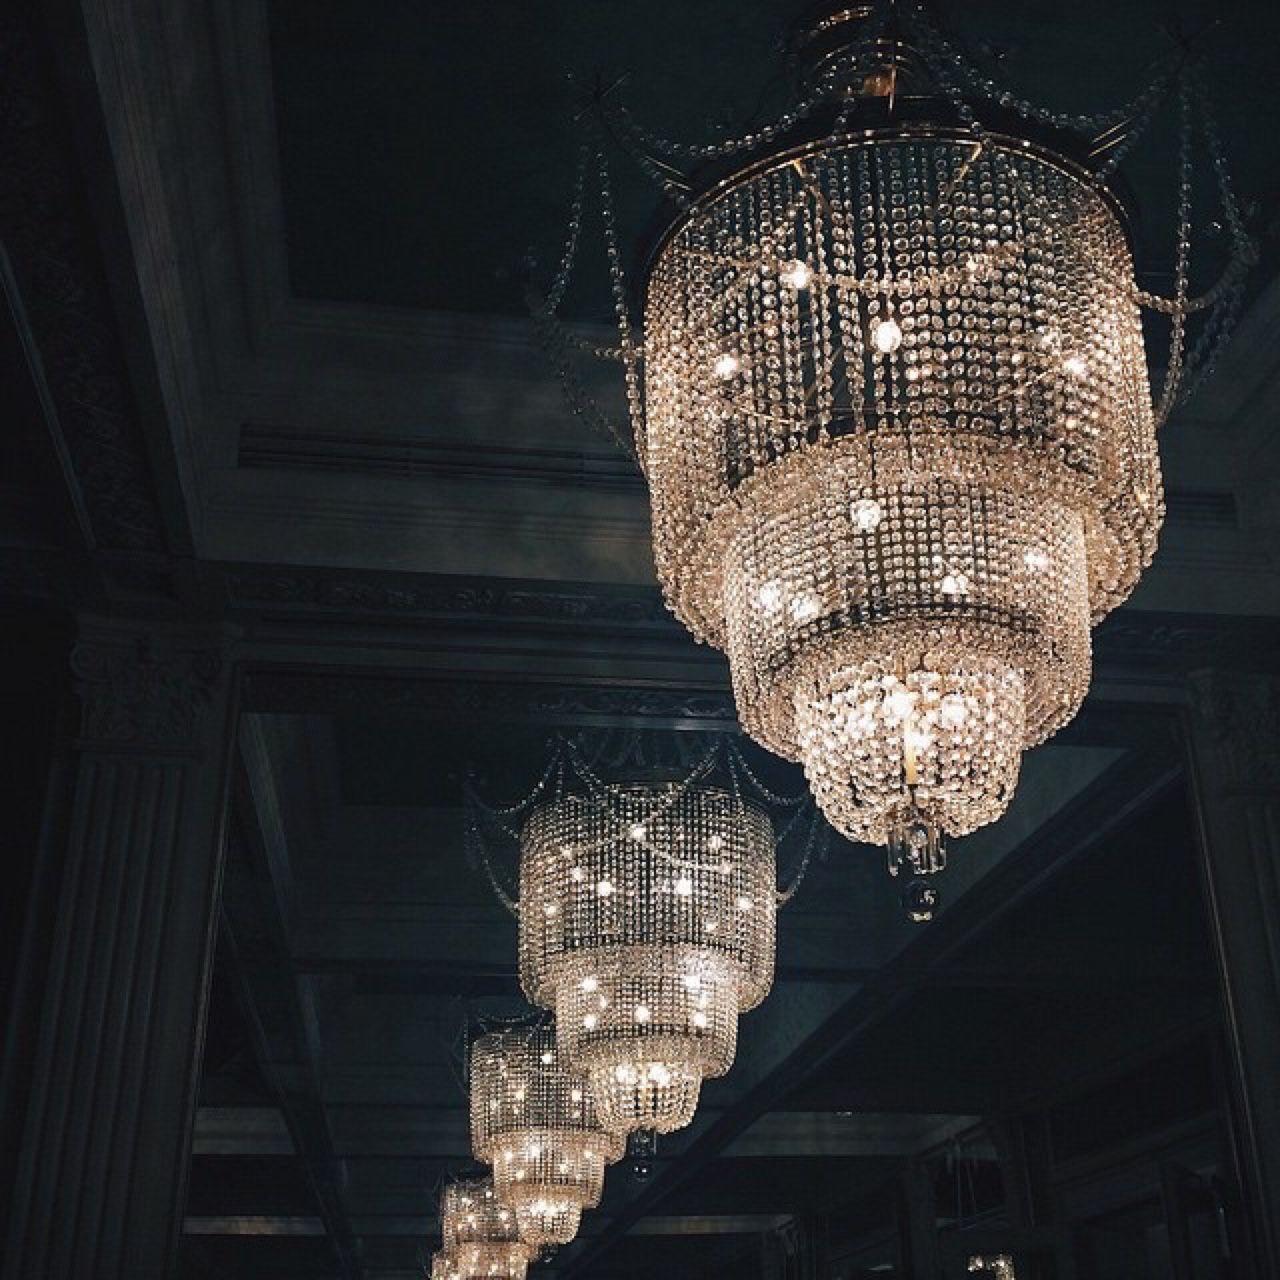 Ceiling Lights Lights & Lighting Aspiring 2019 New Arrival Led Crystal Ceiling Lights Lustres De Sala Beautiful Rose Style For Bedroom Dining Room Free Shipping